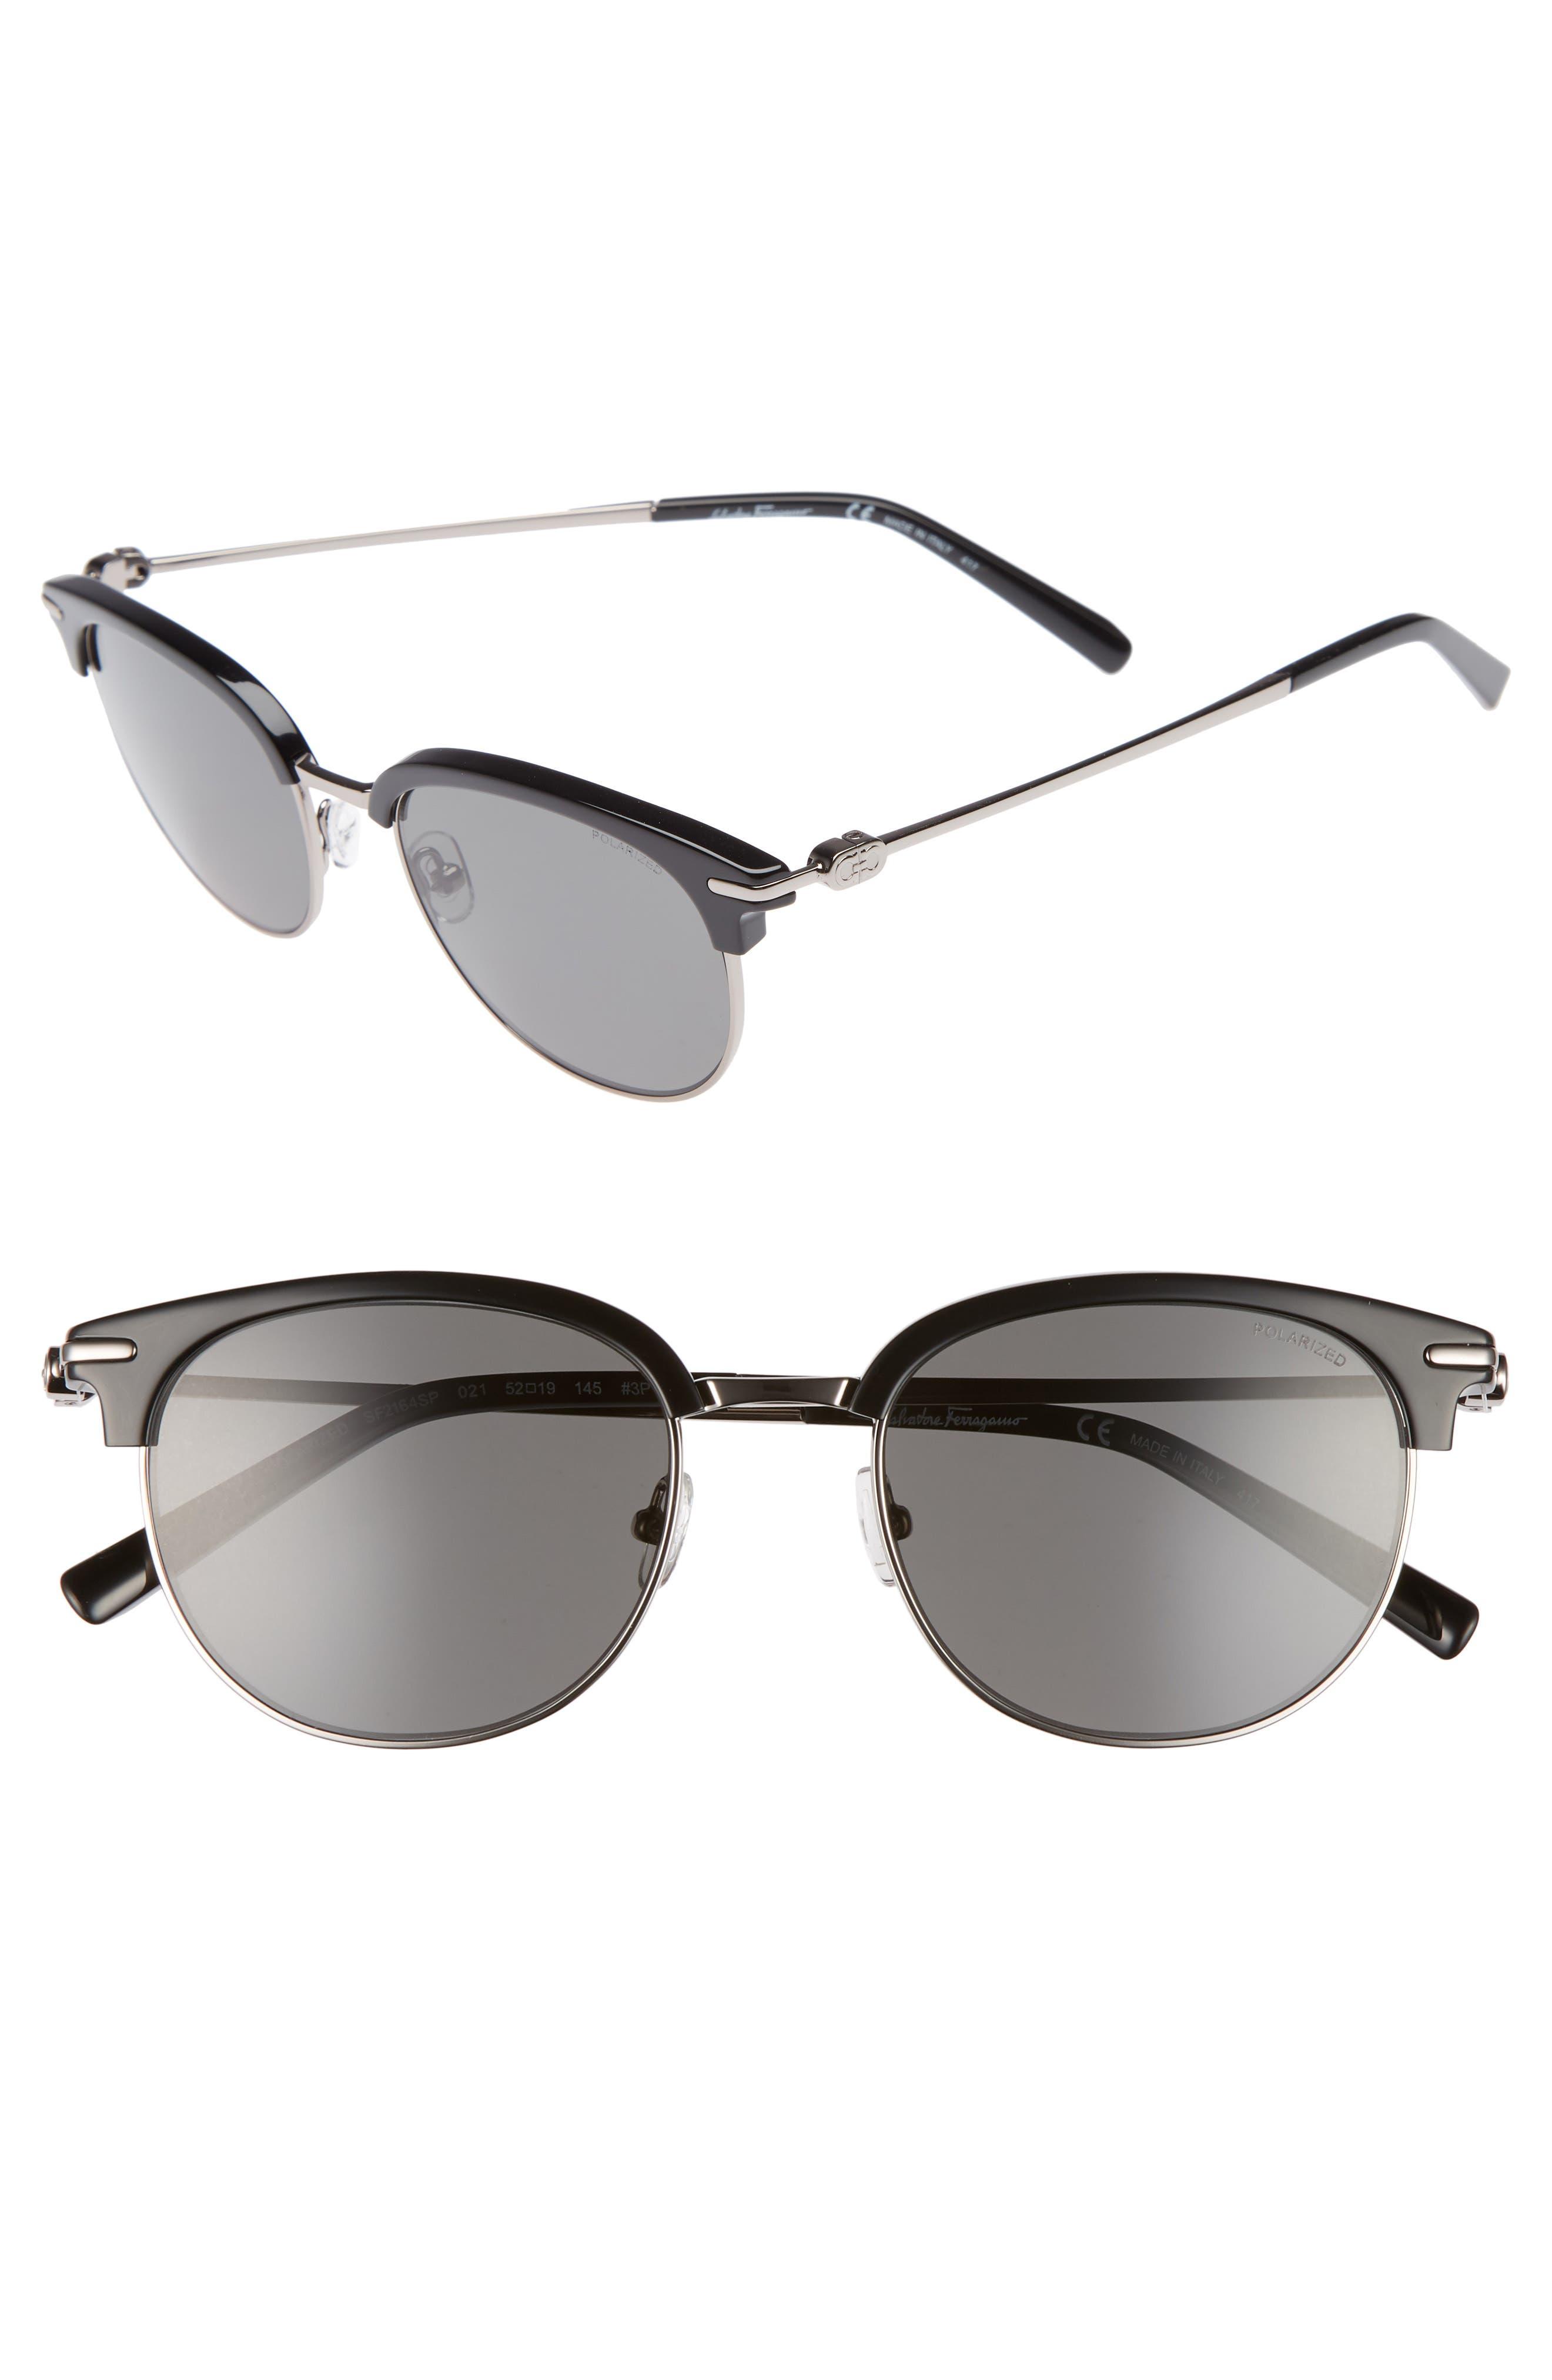 Double Gancio 52mm Polarized Sunglasses,                             Main thumbnail 1, color,                             BLACK/ RUTHENIUM